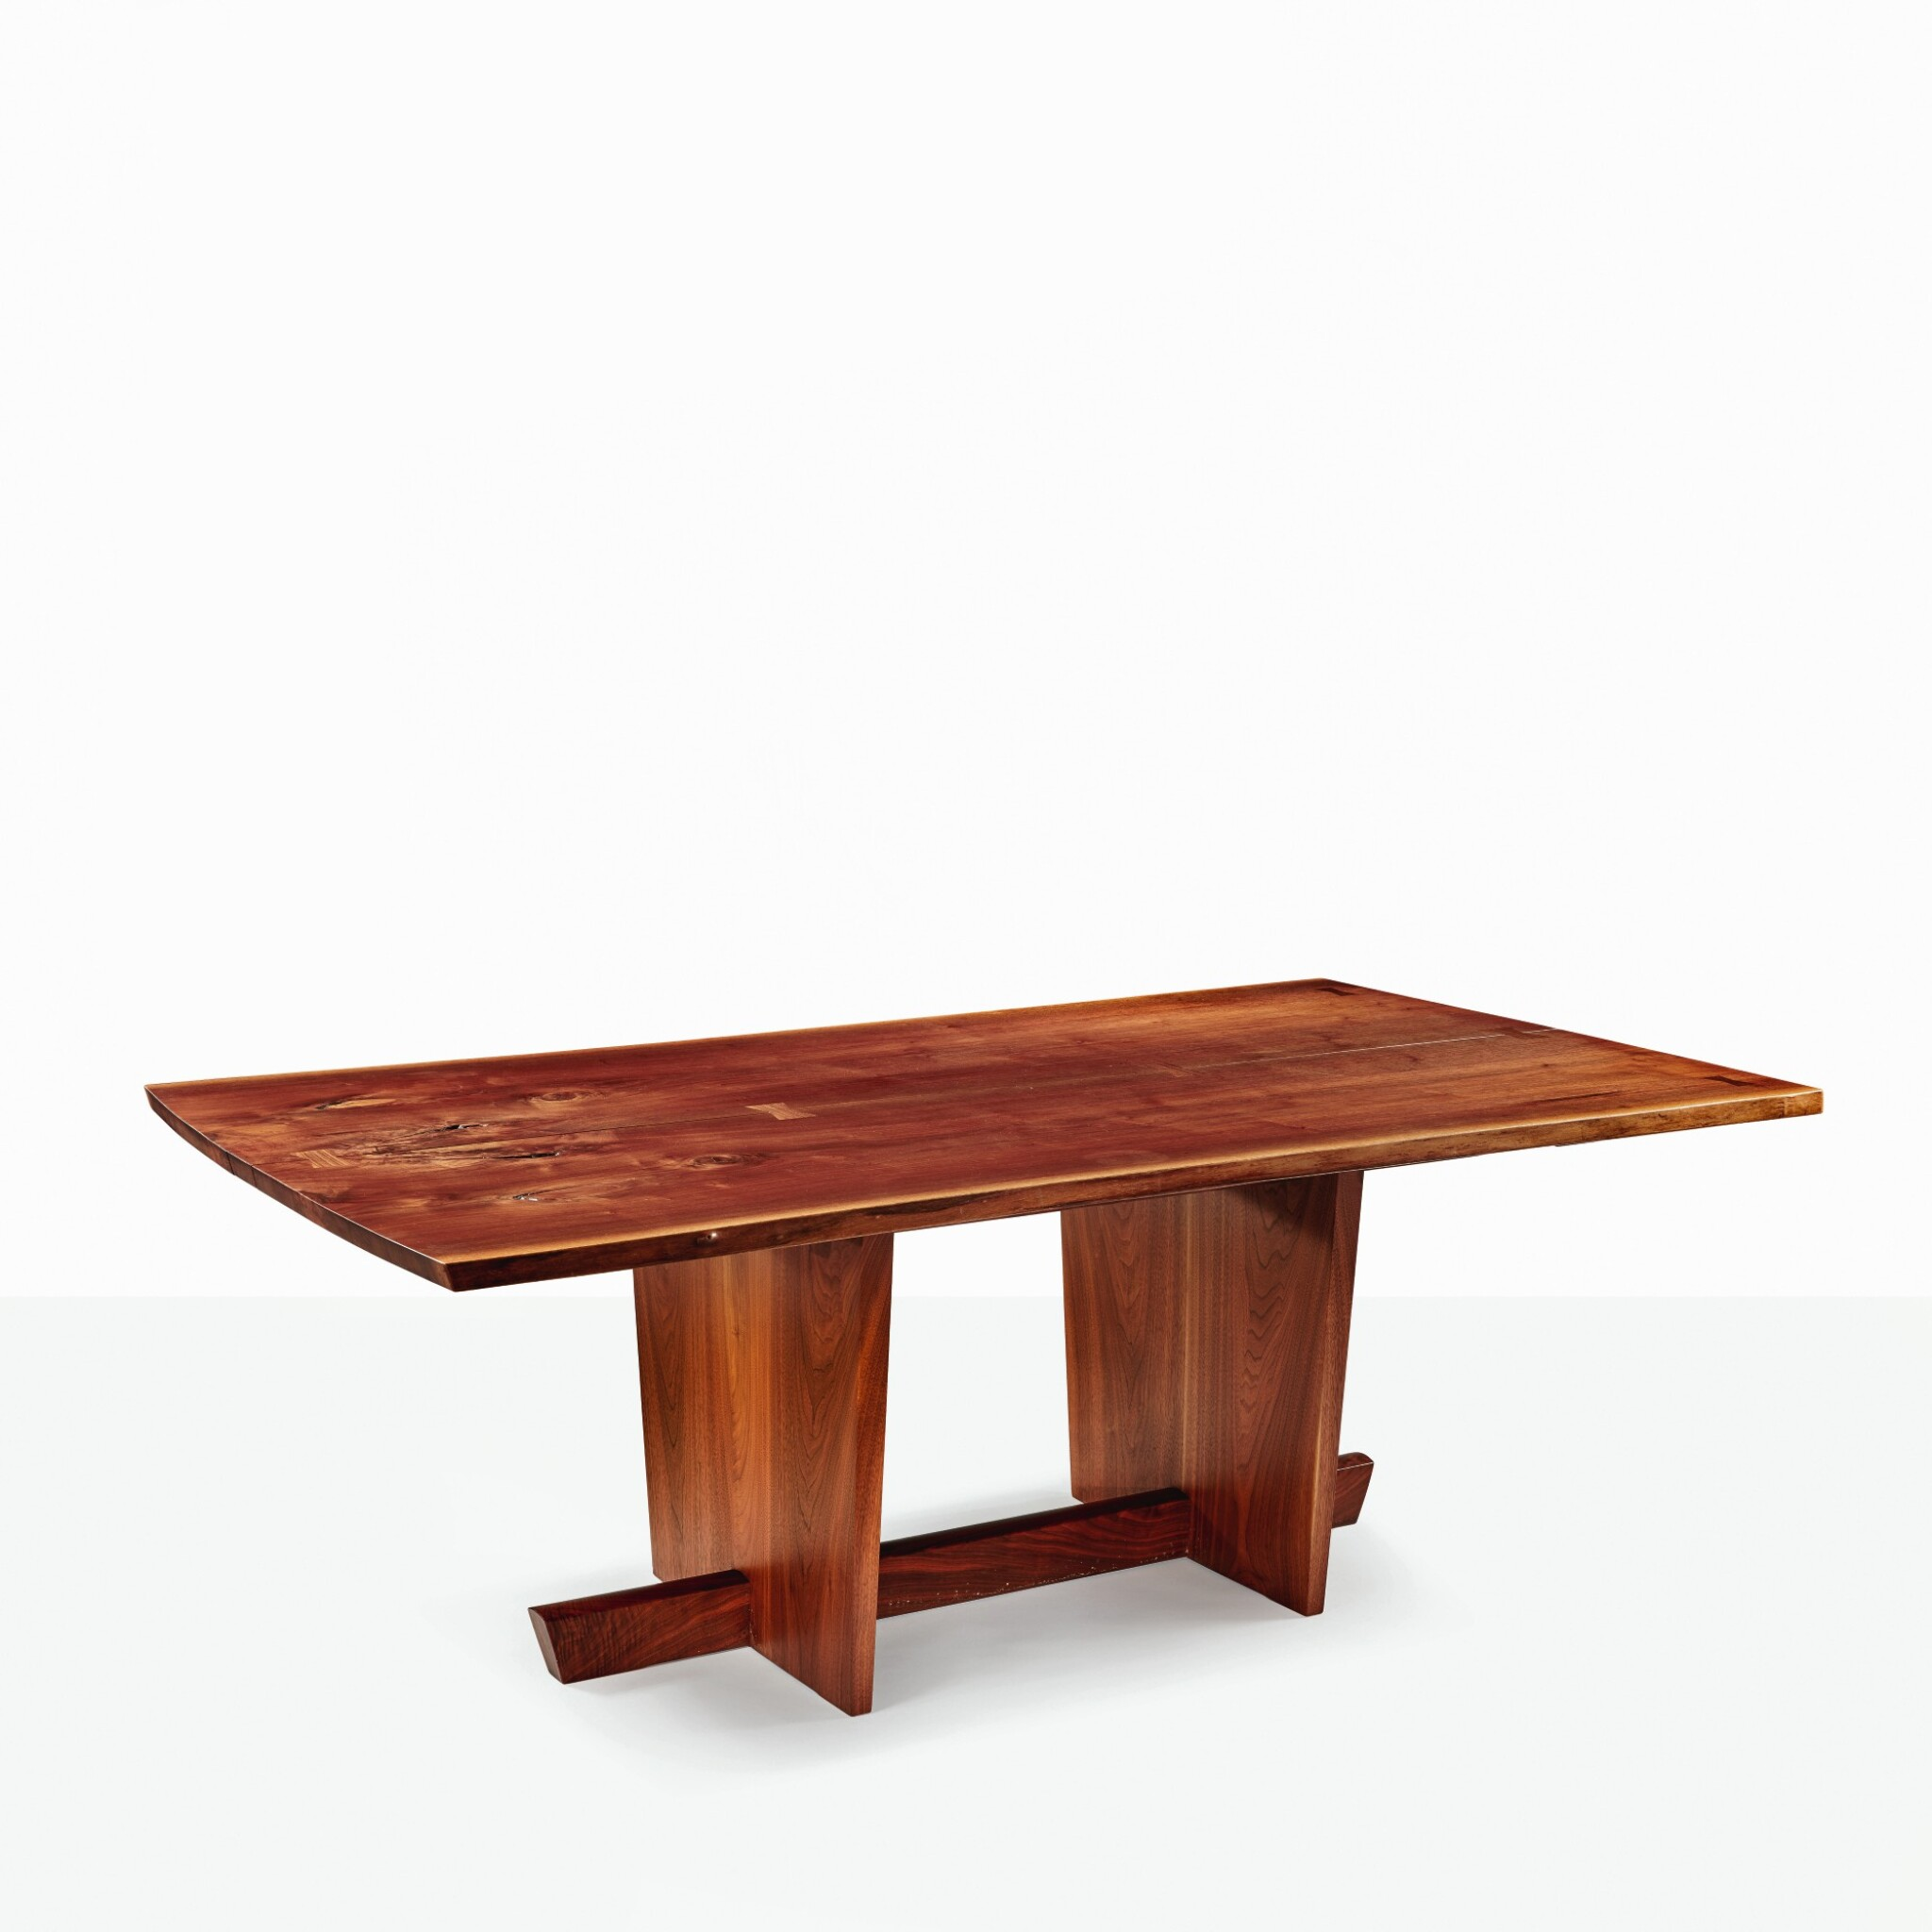 George Nakashima Minguren Ii Dining Table Design2020 Sotheby S